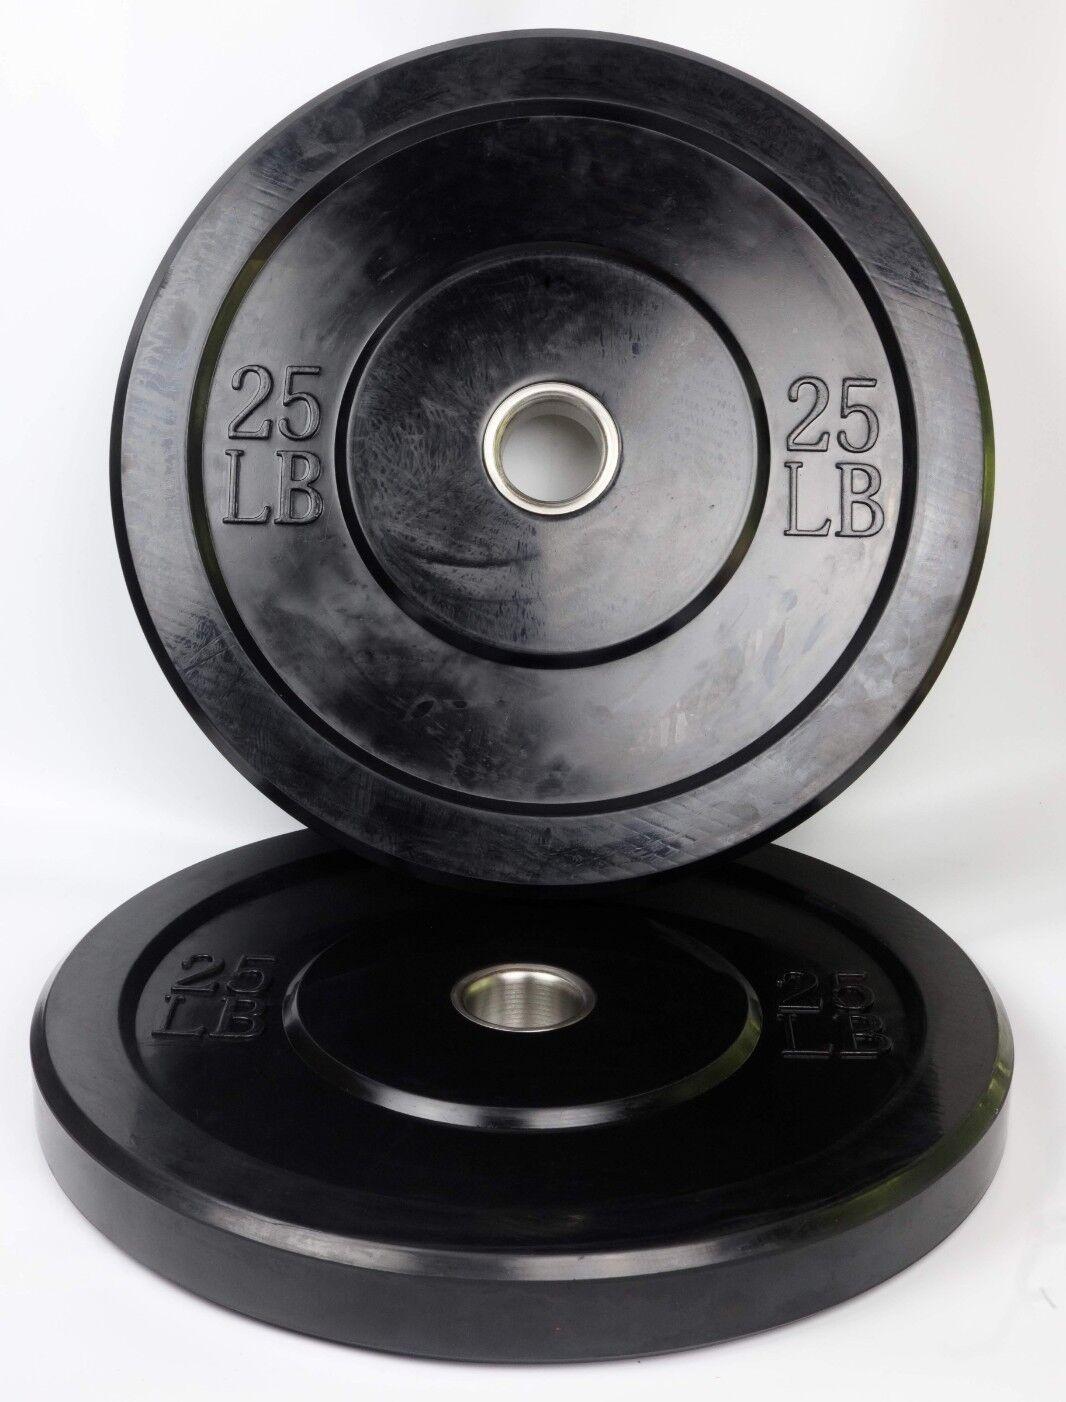 Bumper Plates 25 LB Pair Solid Rubber 2